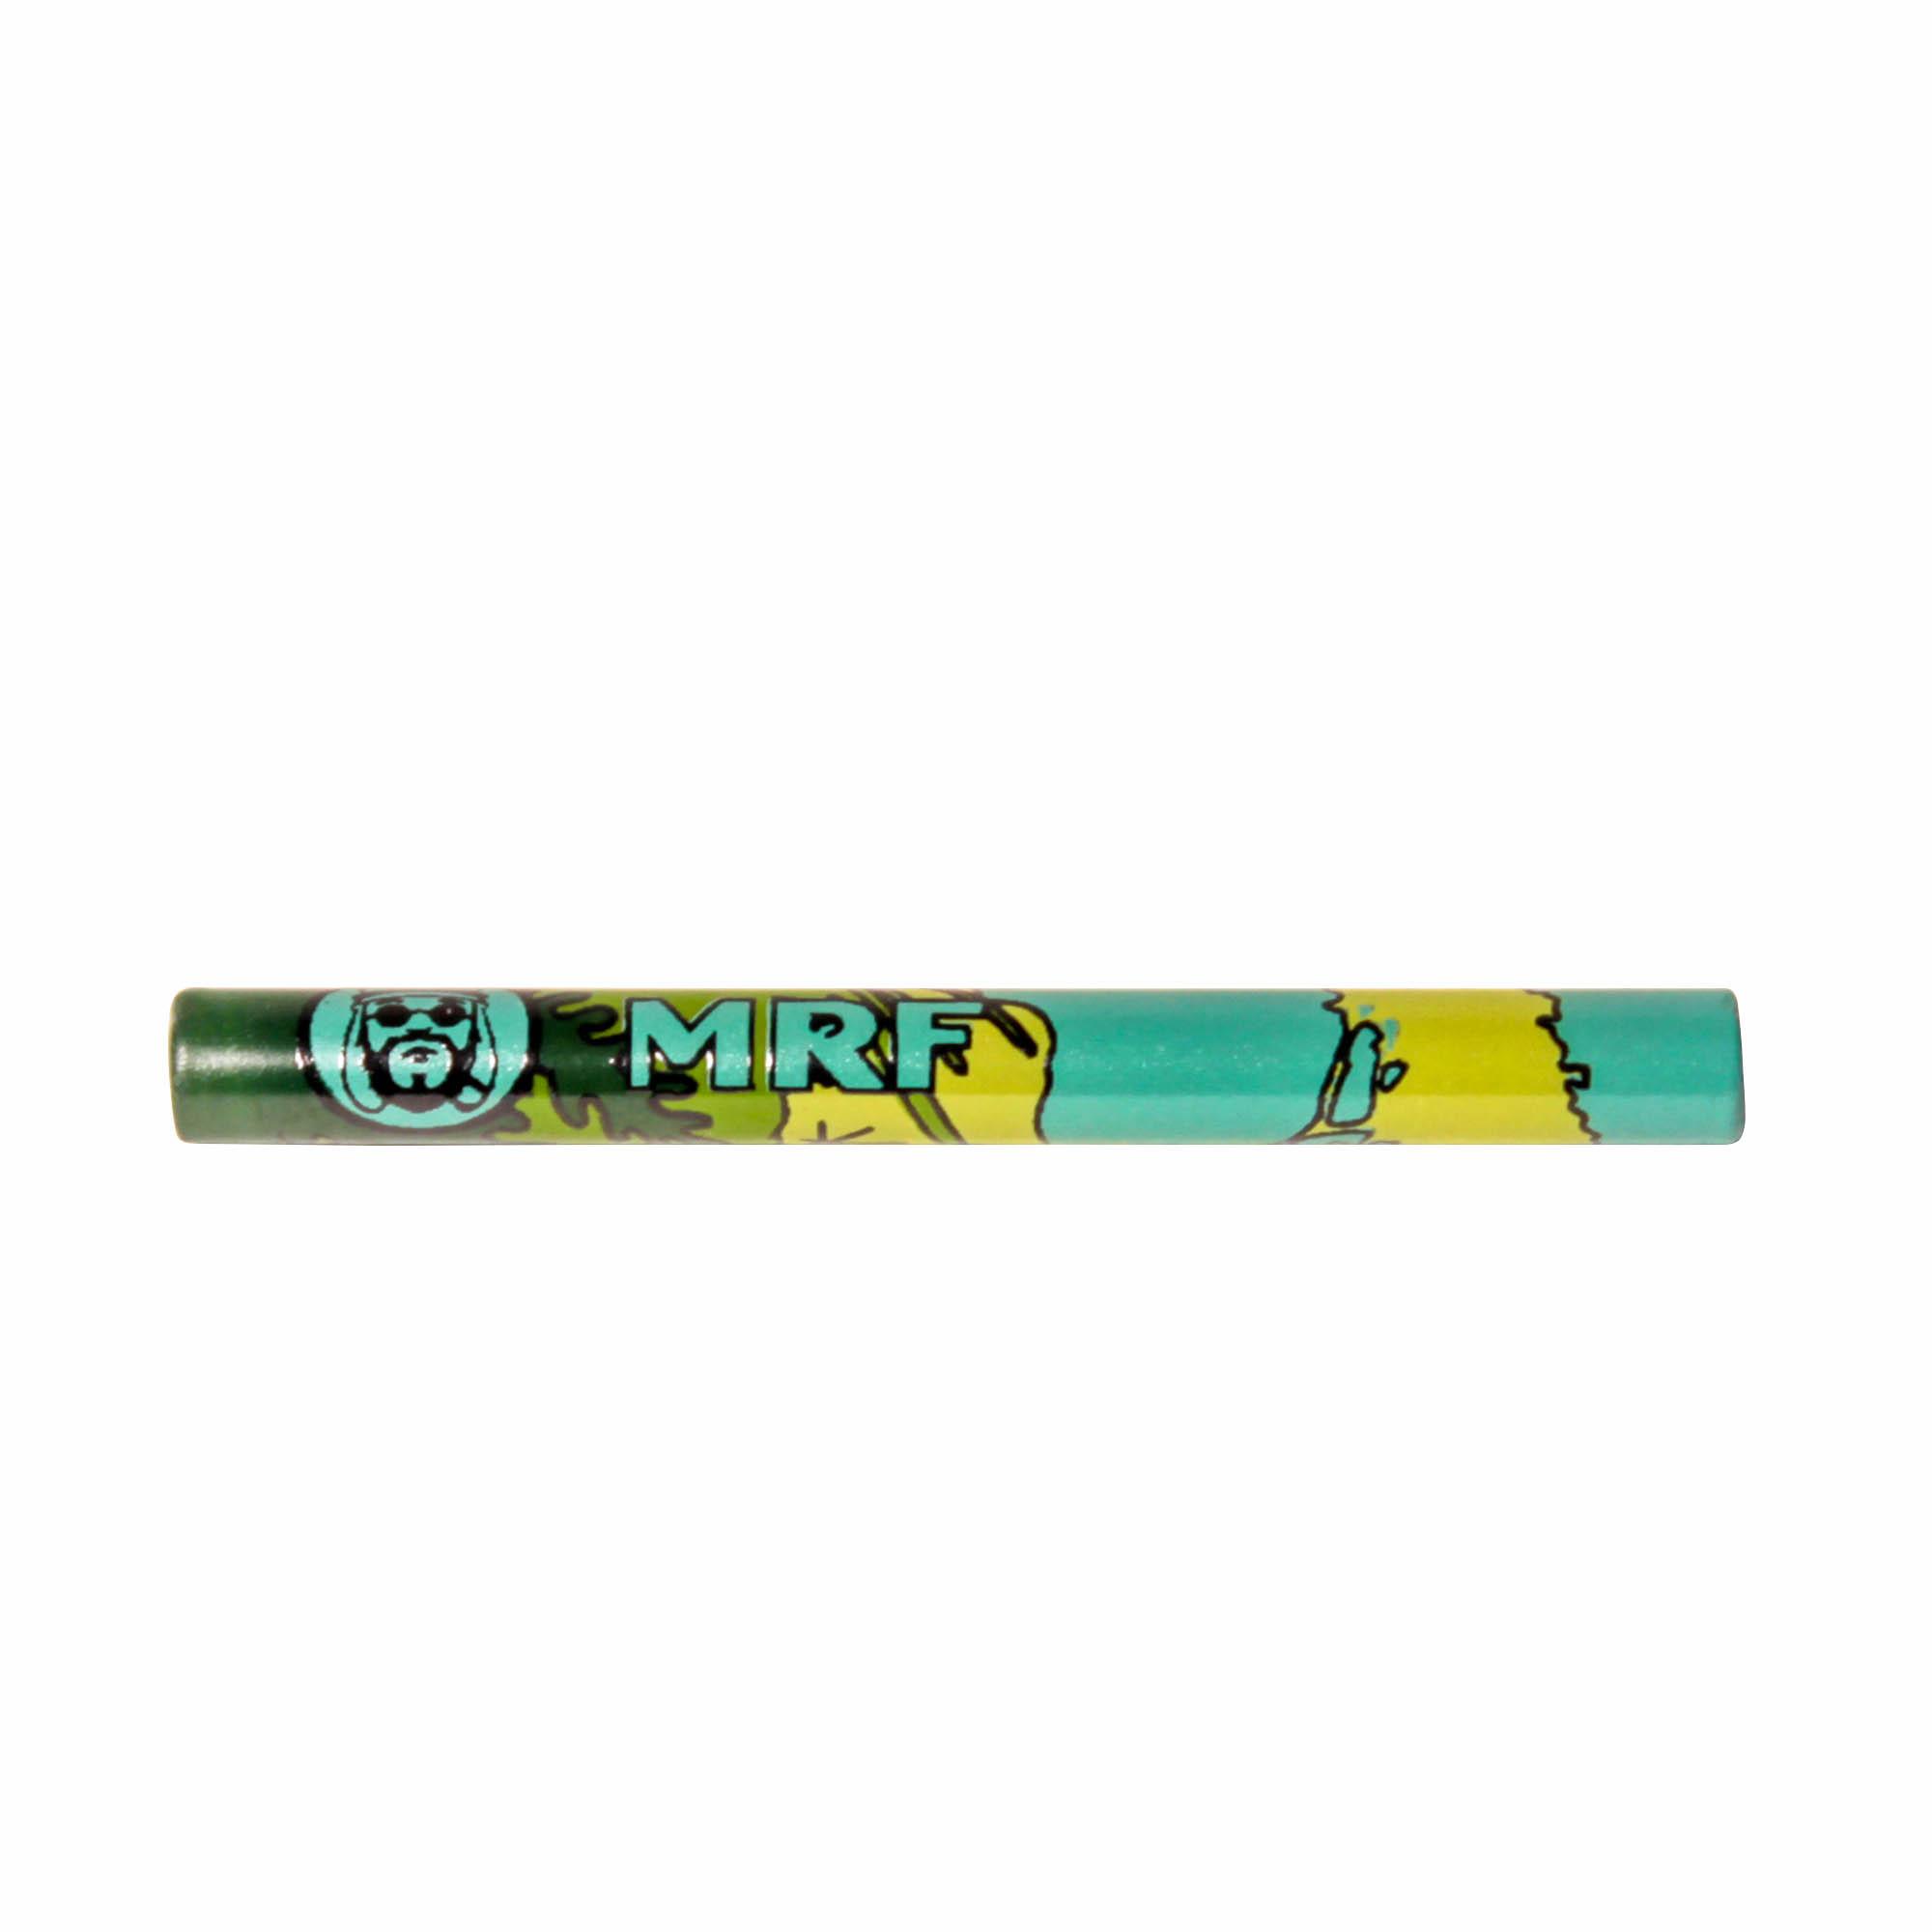 Piteira de Vidro MRF Elements Collection - Terra (6 mm)  - Mr. Fumo